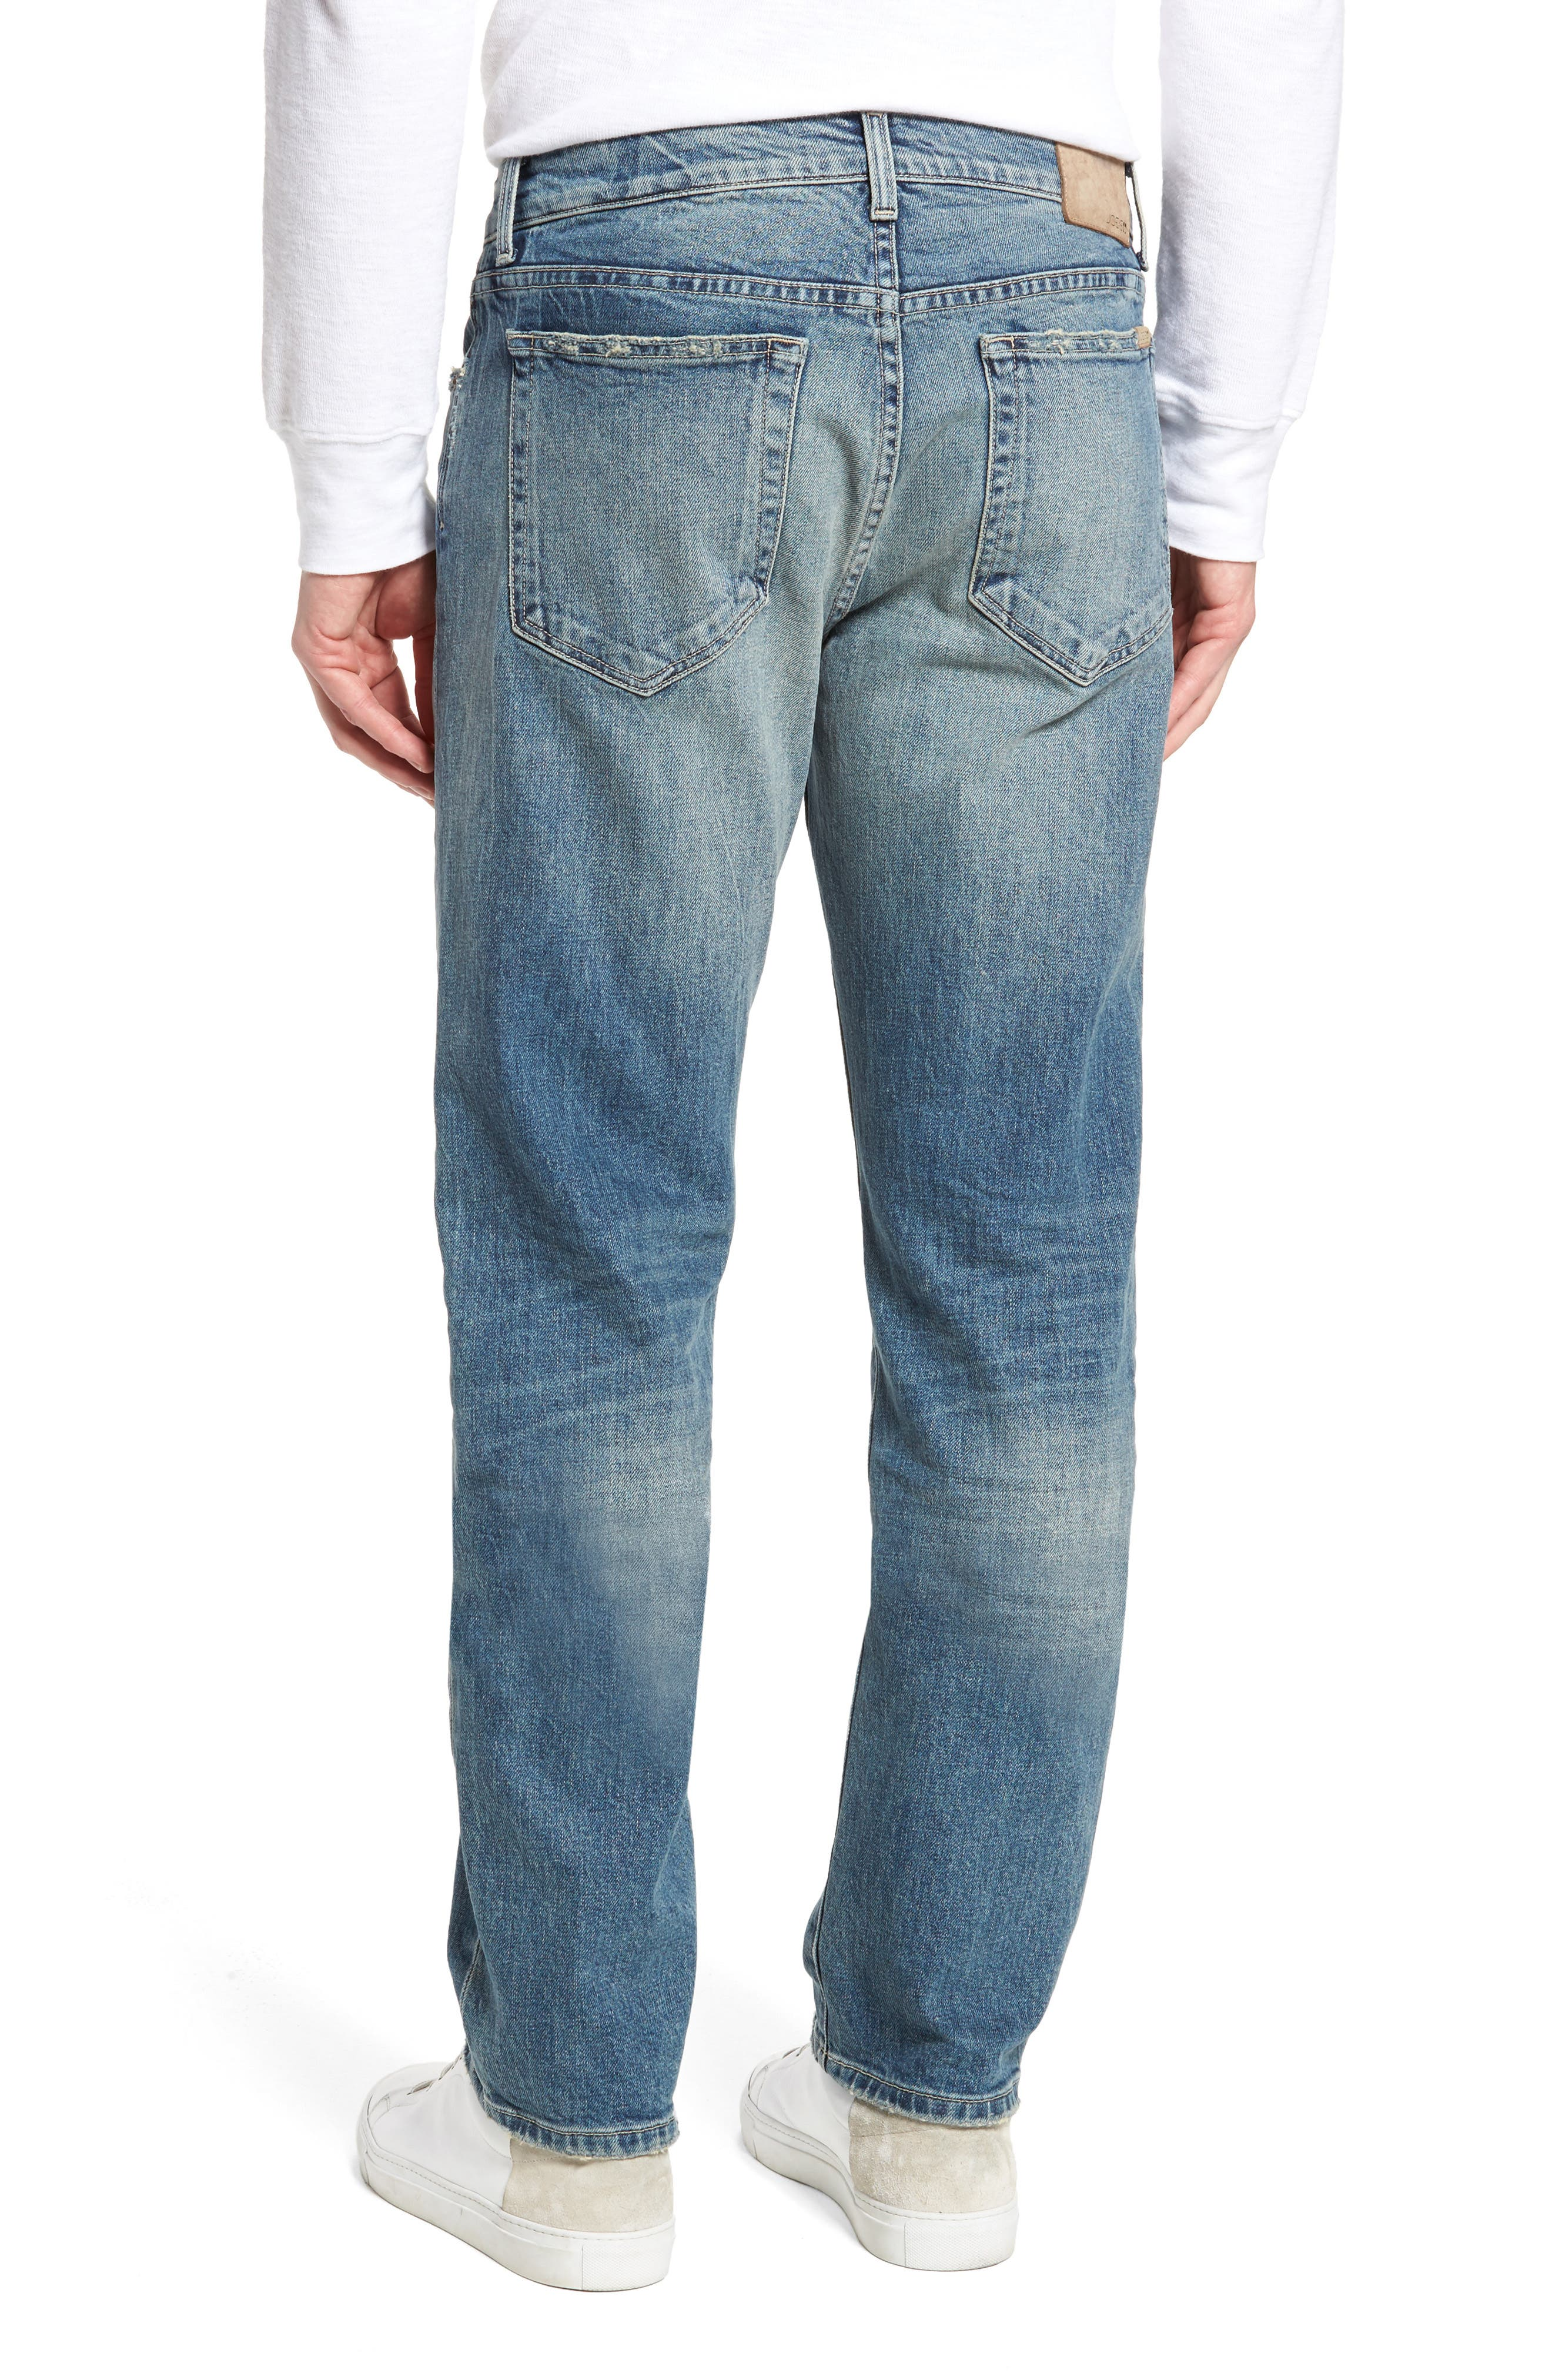 Brixton Slim Straight Fit Jeans,                             Alternate thumbnail 2, color,                             Harken